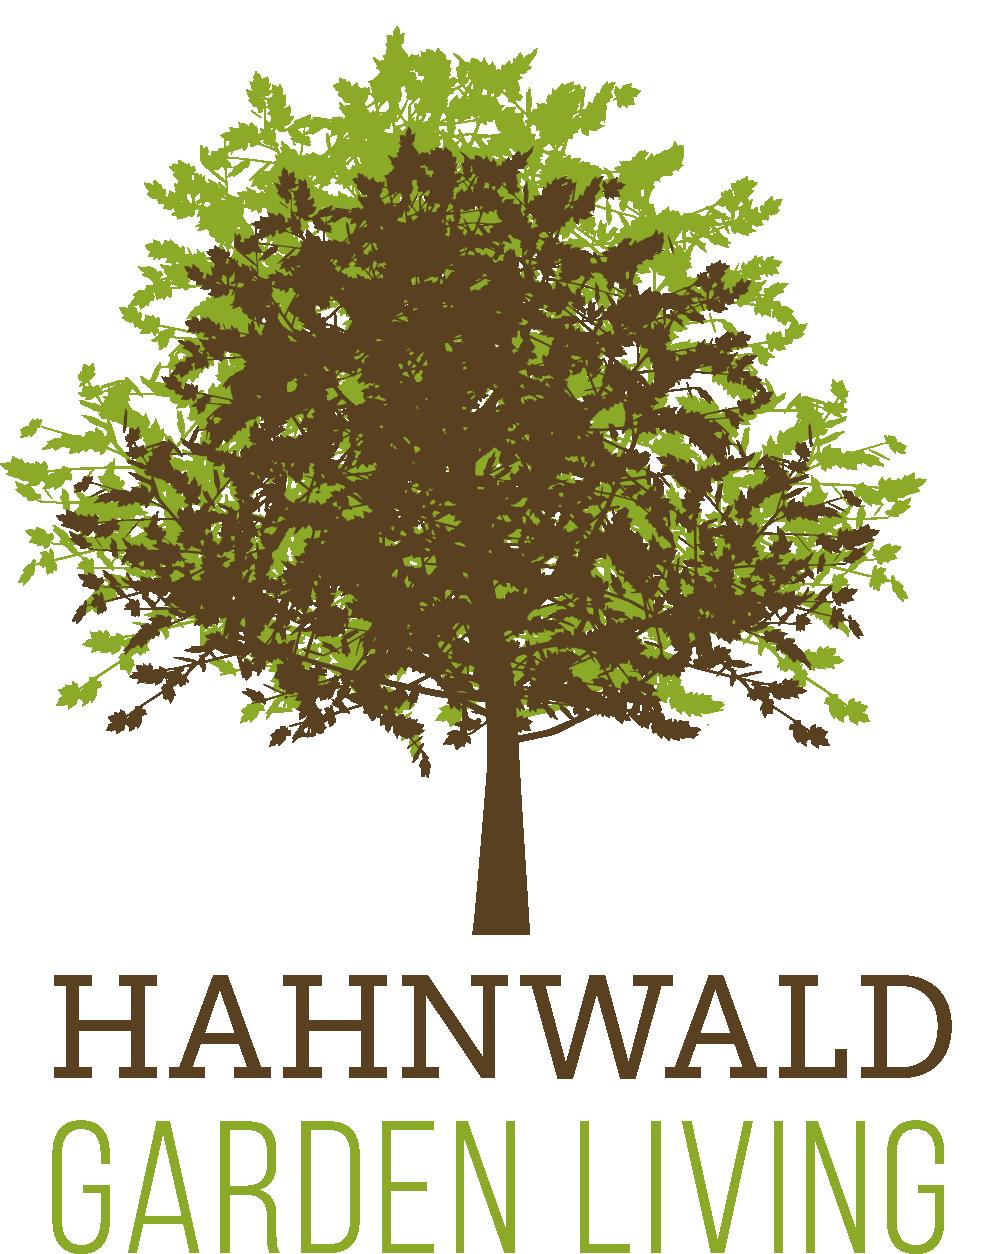 Hahnwald Garden Living